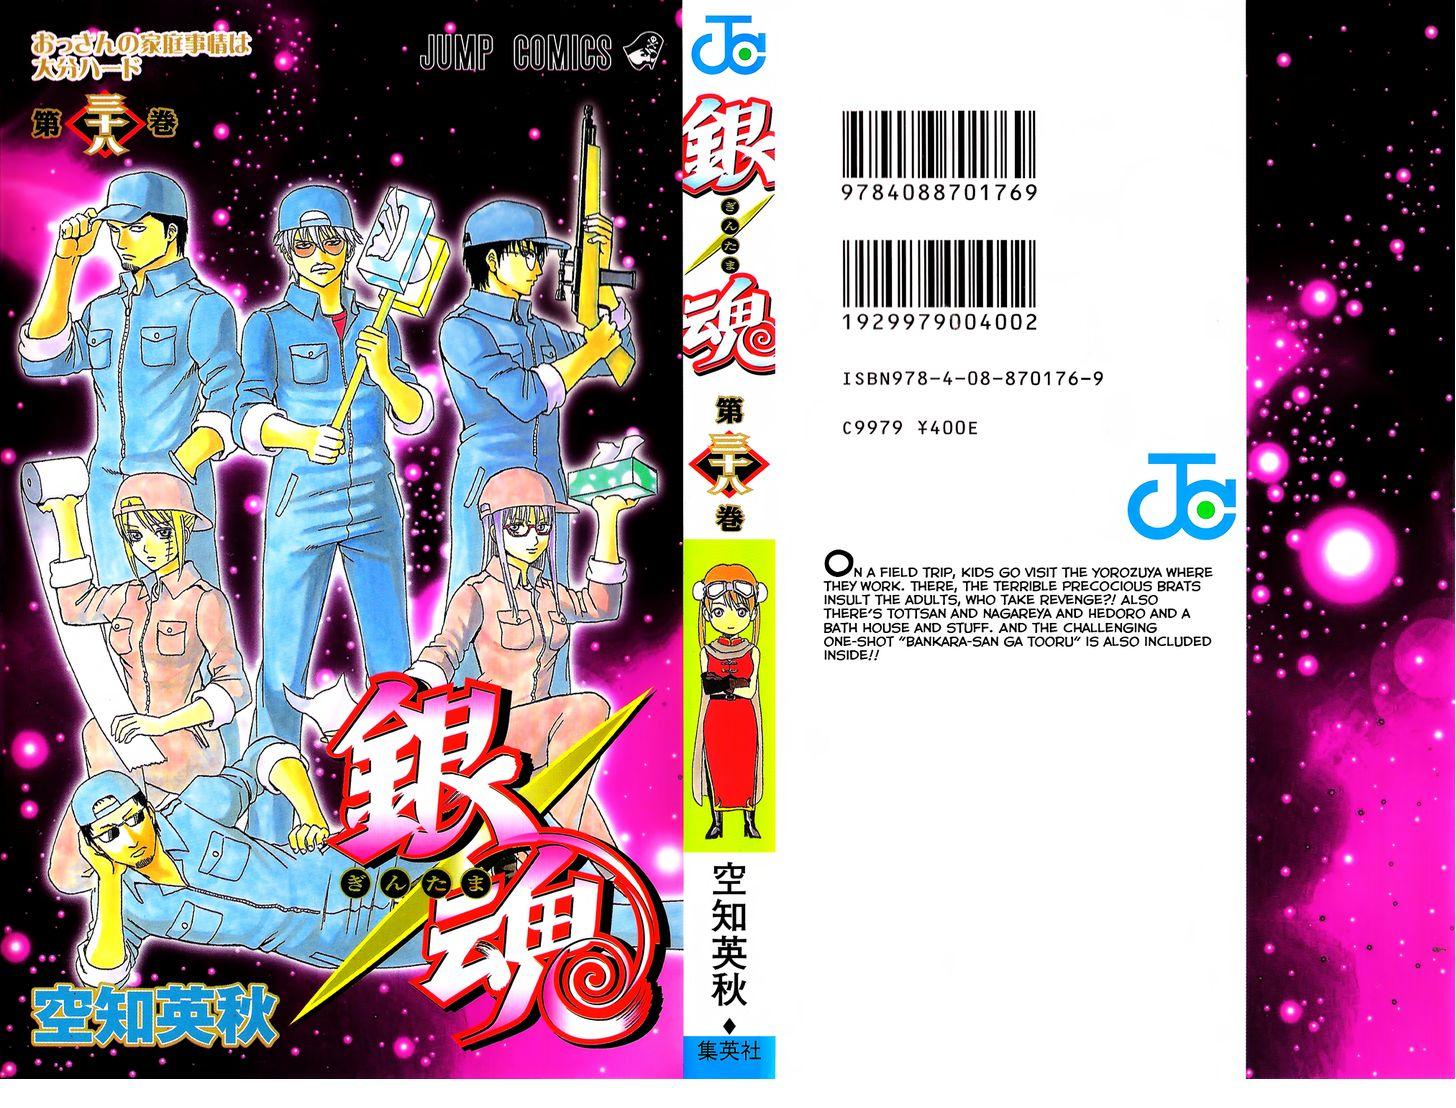 https://im.nineanime.com/comics/pic9/18/210/17168/Gintama3290213.jpg Page 1